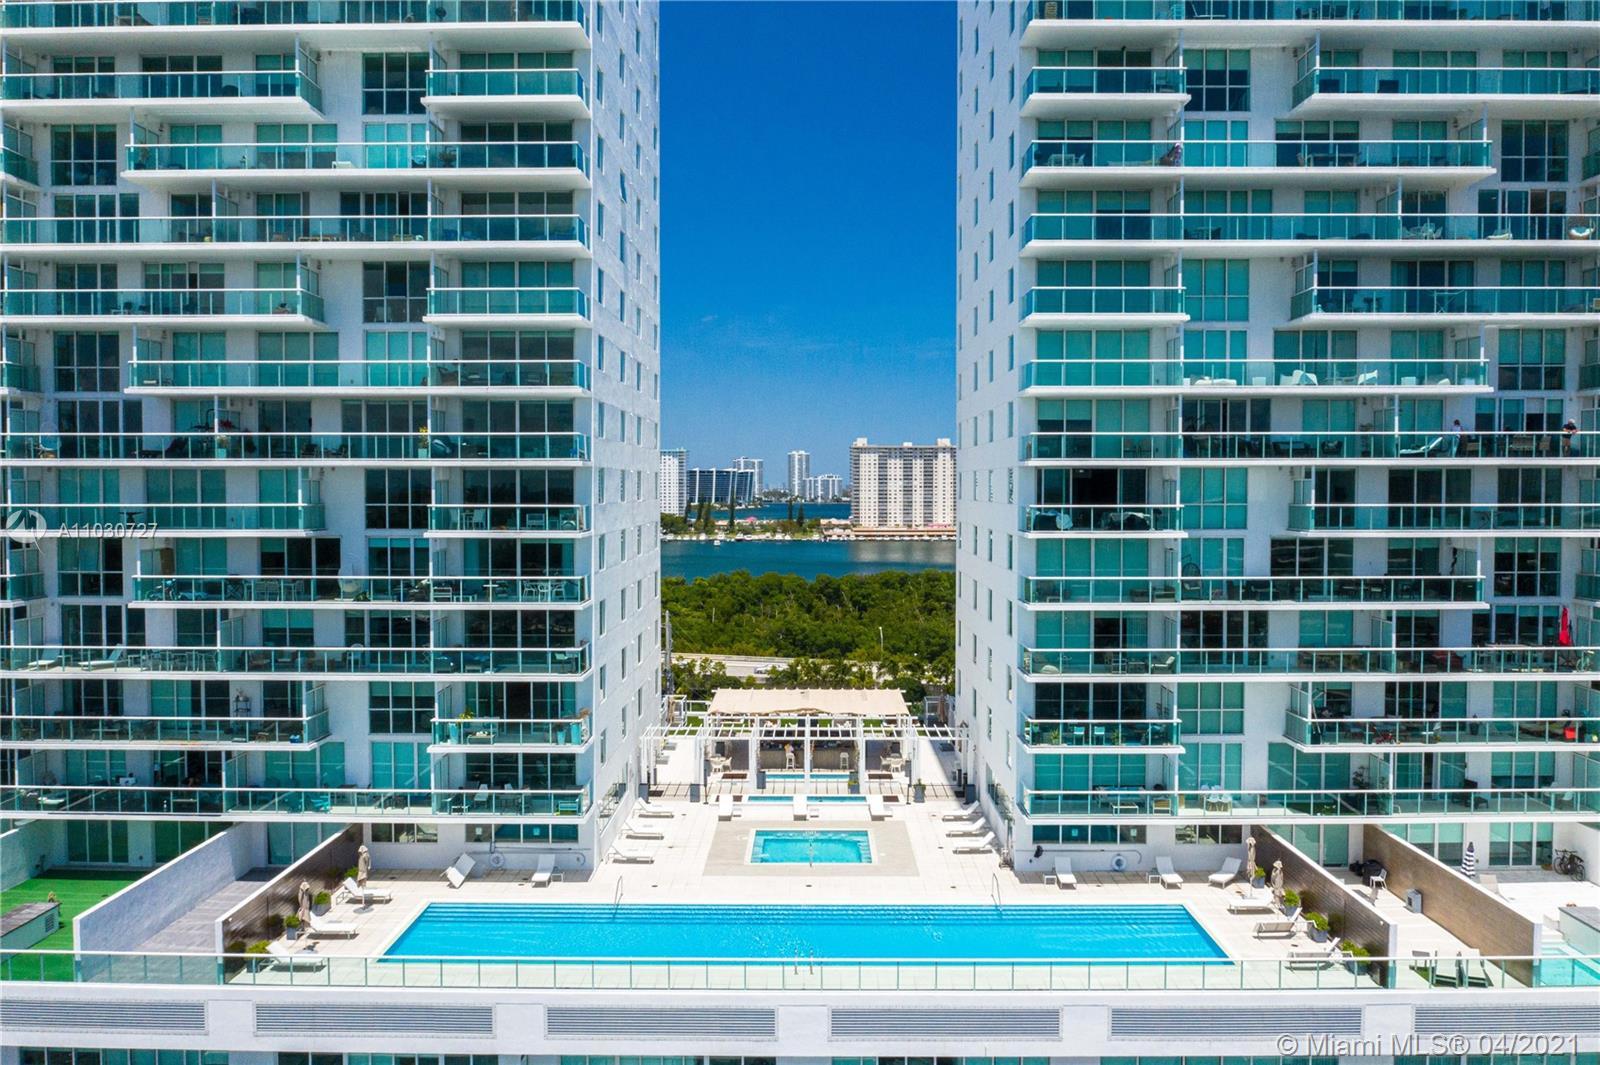 400 Sunny Isles #1617 - 400 Sunny Isles Blvd #1617, Sunny Isles Beach, FL 33160